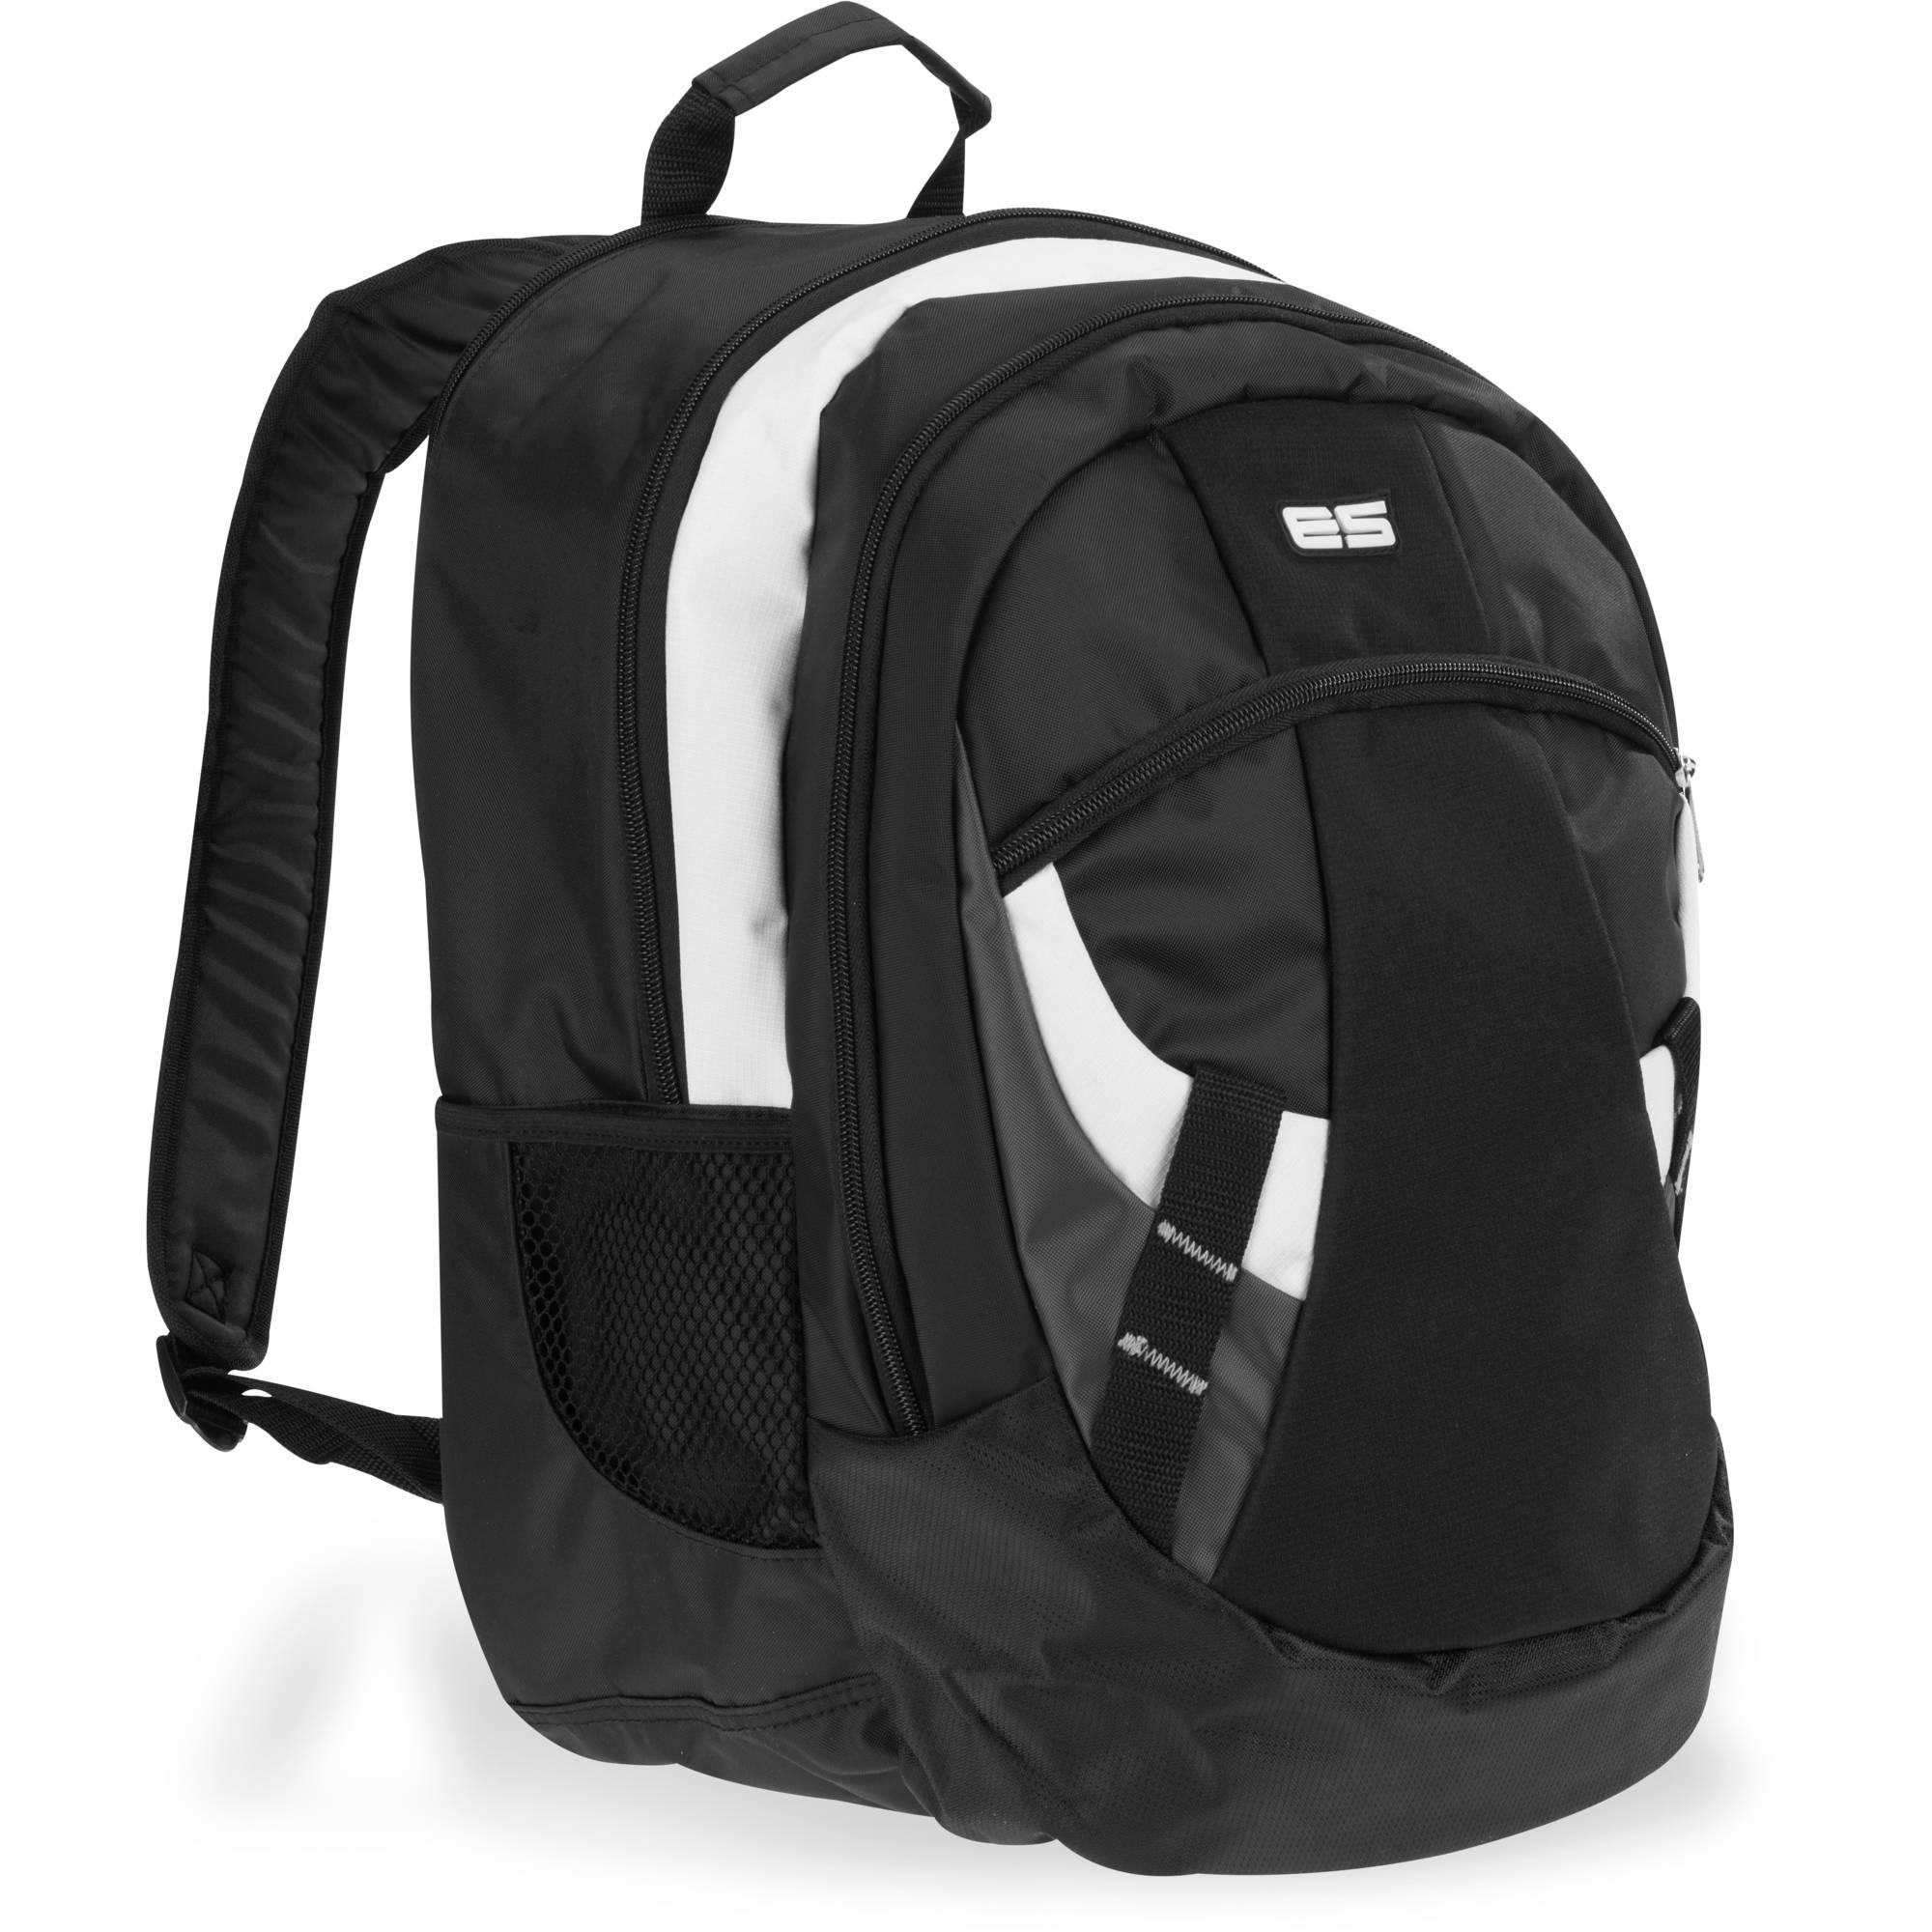 "Eastsport Round 17.5"" Backpack"